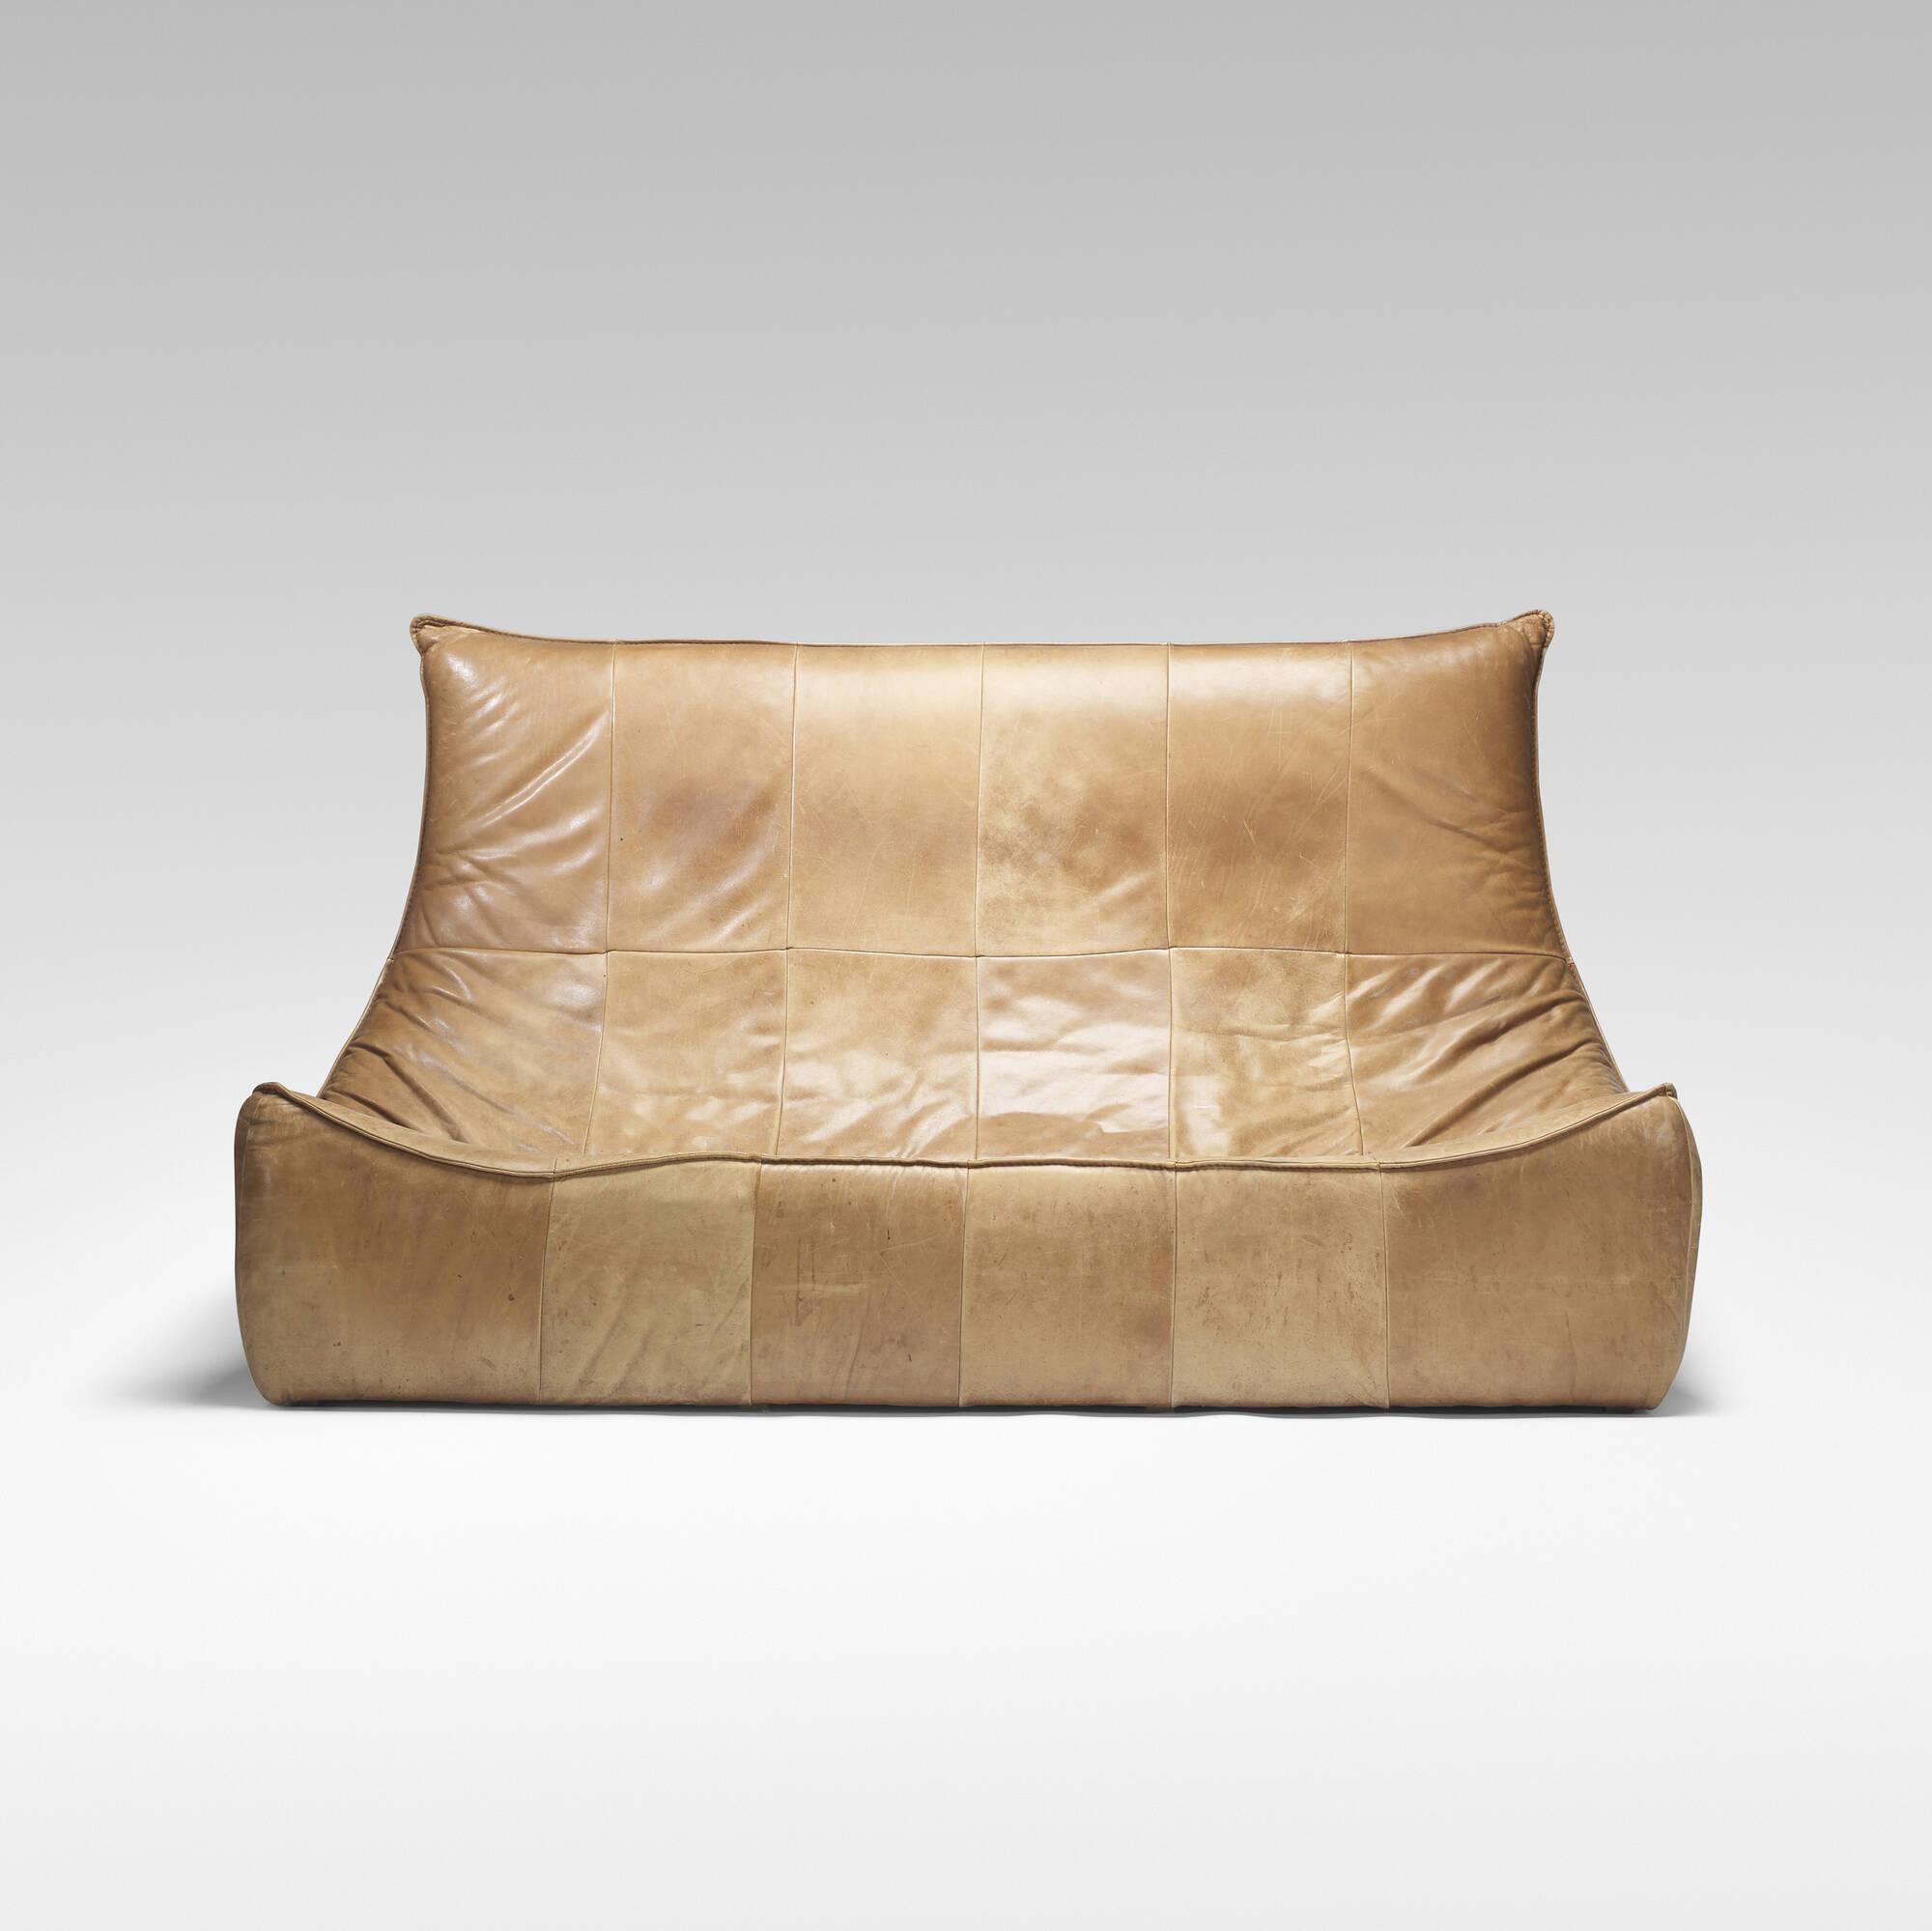 128 gerard van den berg the rock sofa. Black Bedroom Furniture Sets. Home Design Ideas